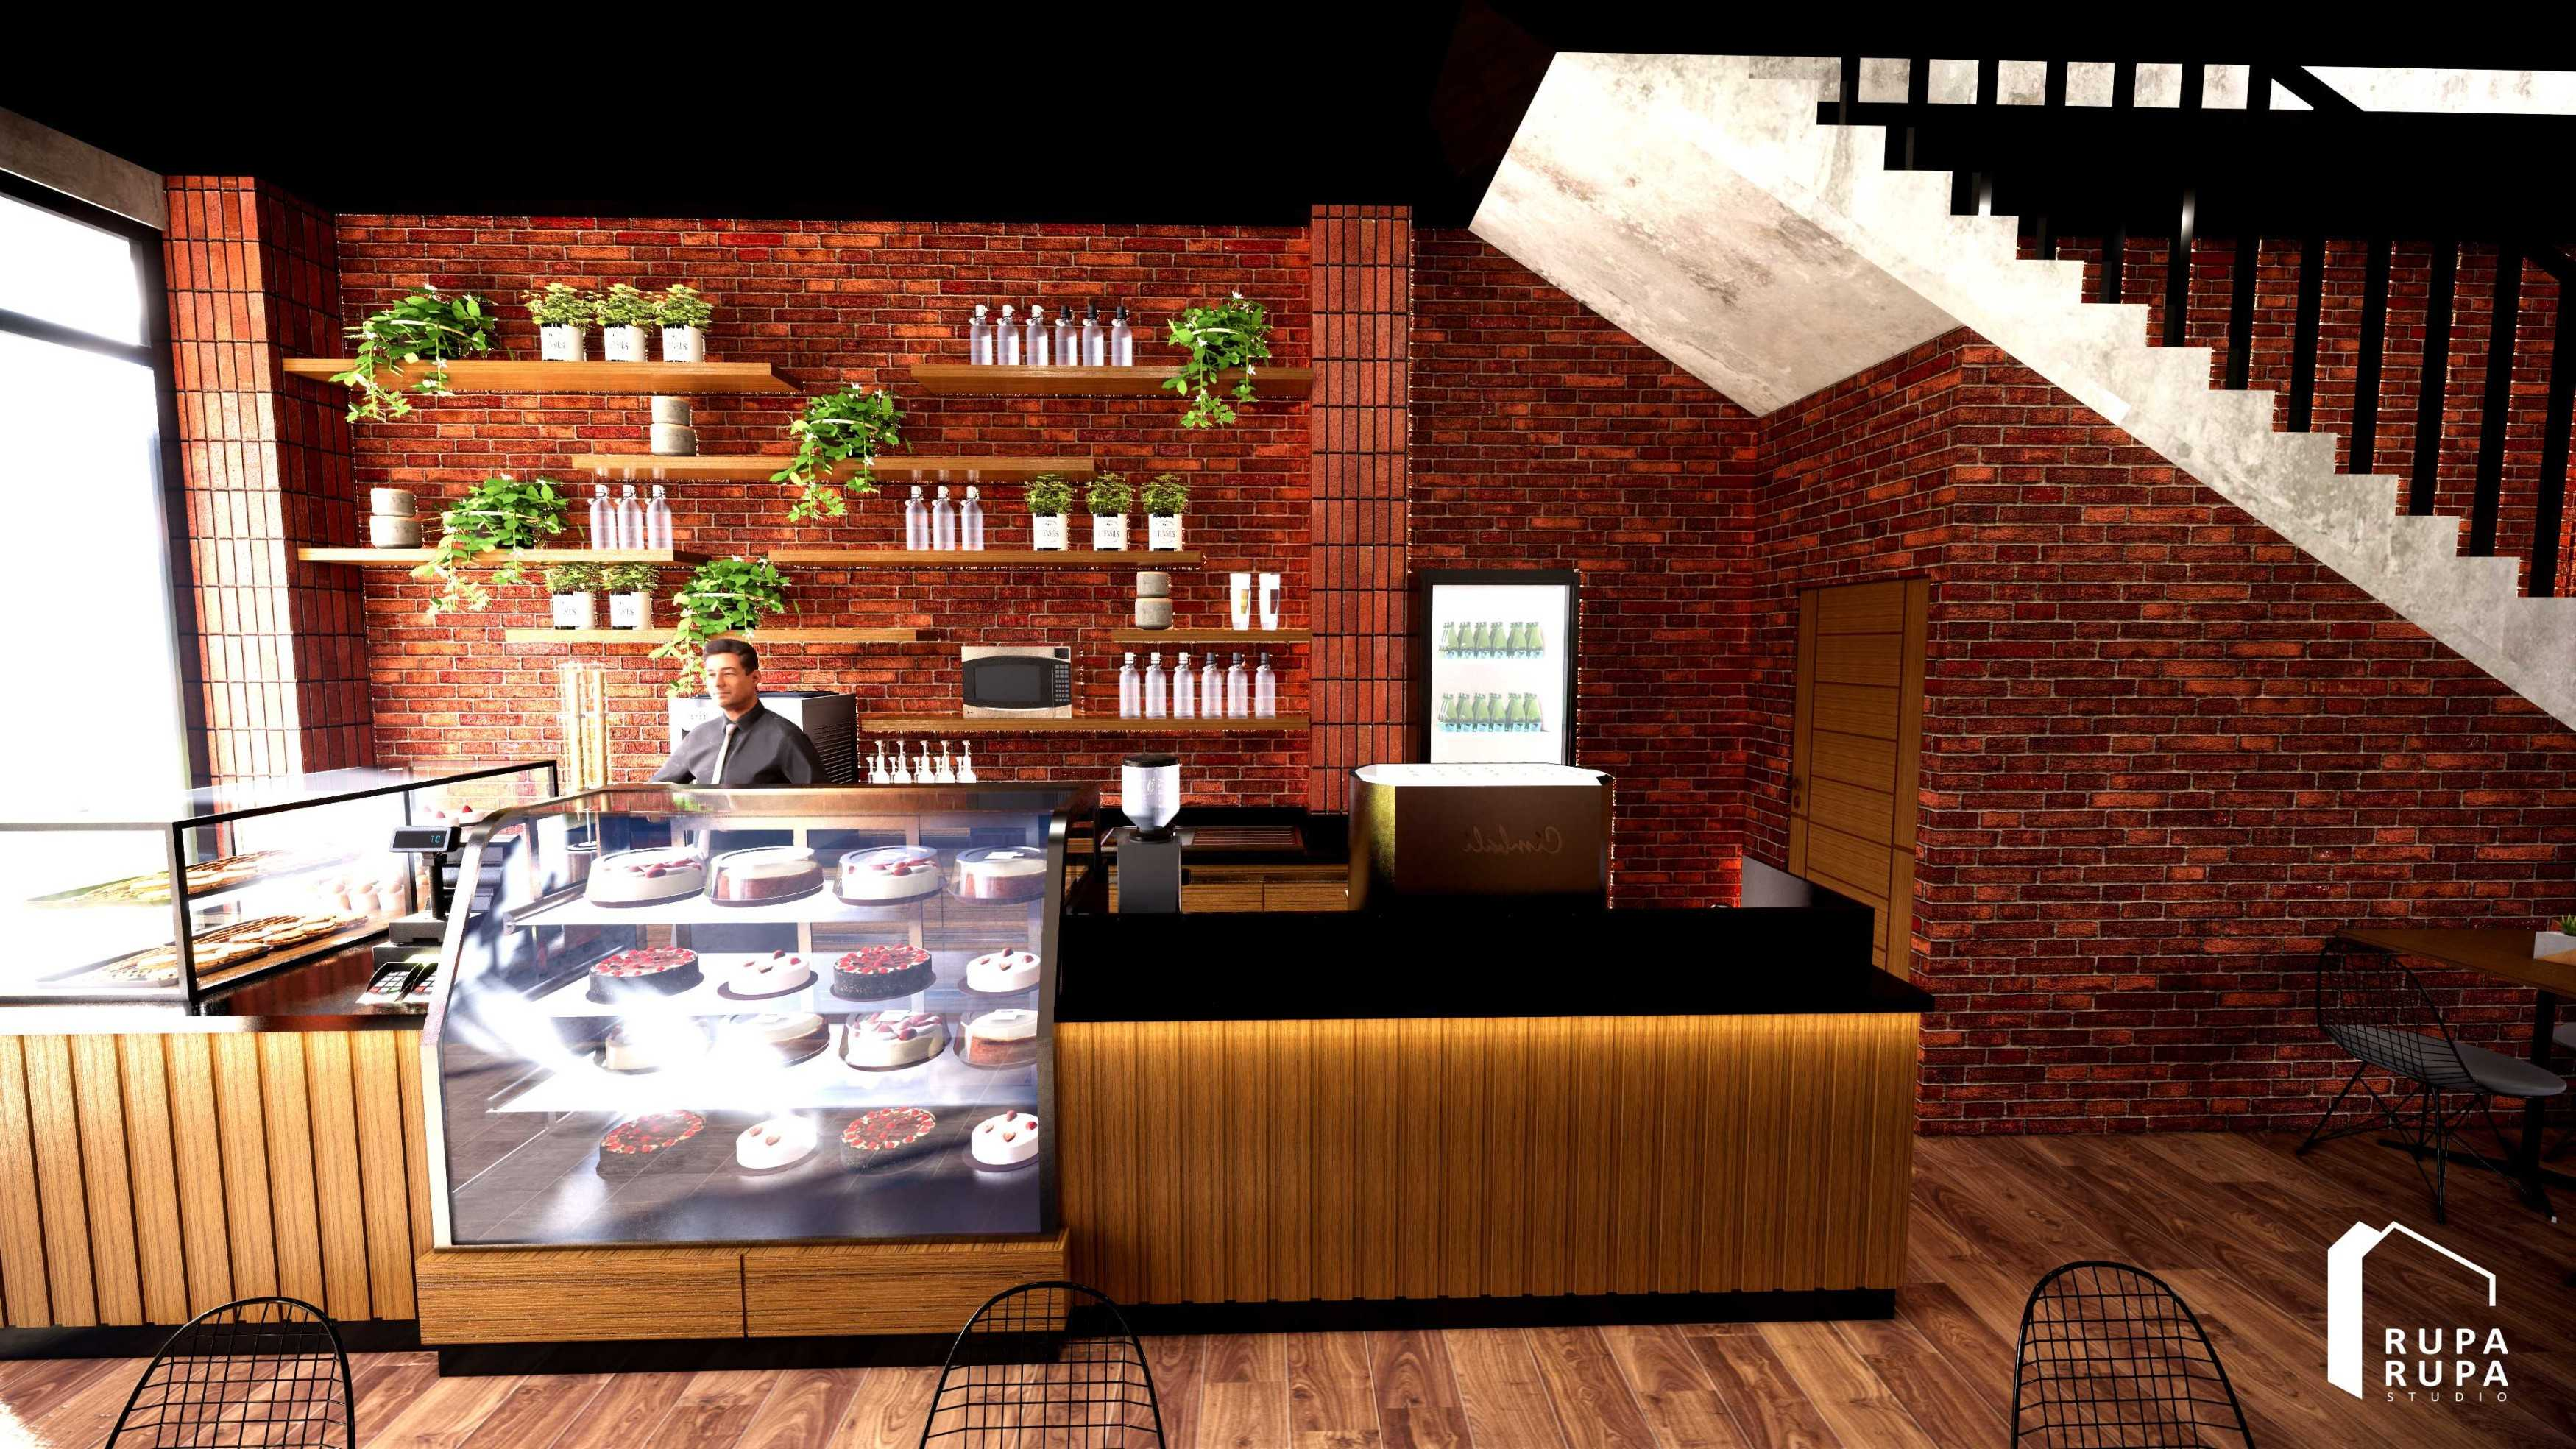 Studio Rupa Rupa Drupadi Corner Cafe Bali, Indonesia Bali, Indonesia Studio-Rupa-Rupa-Drupadi-Corner-Cafe   88067